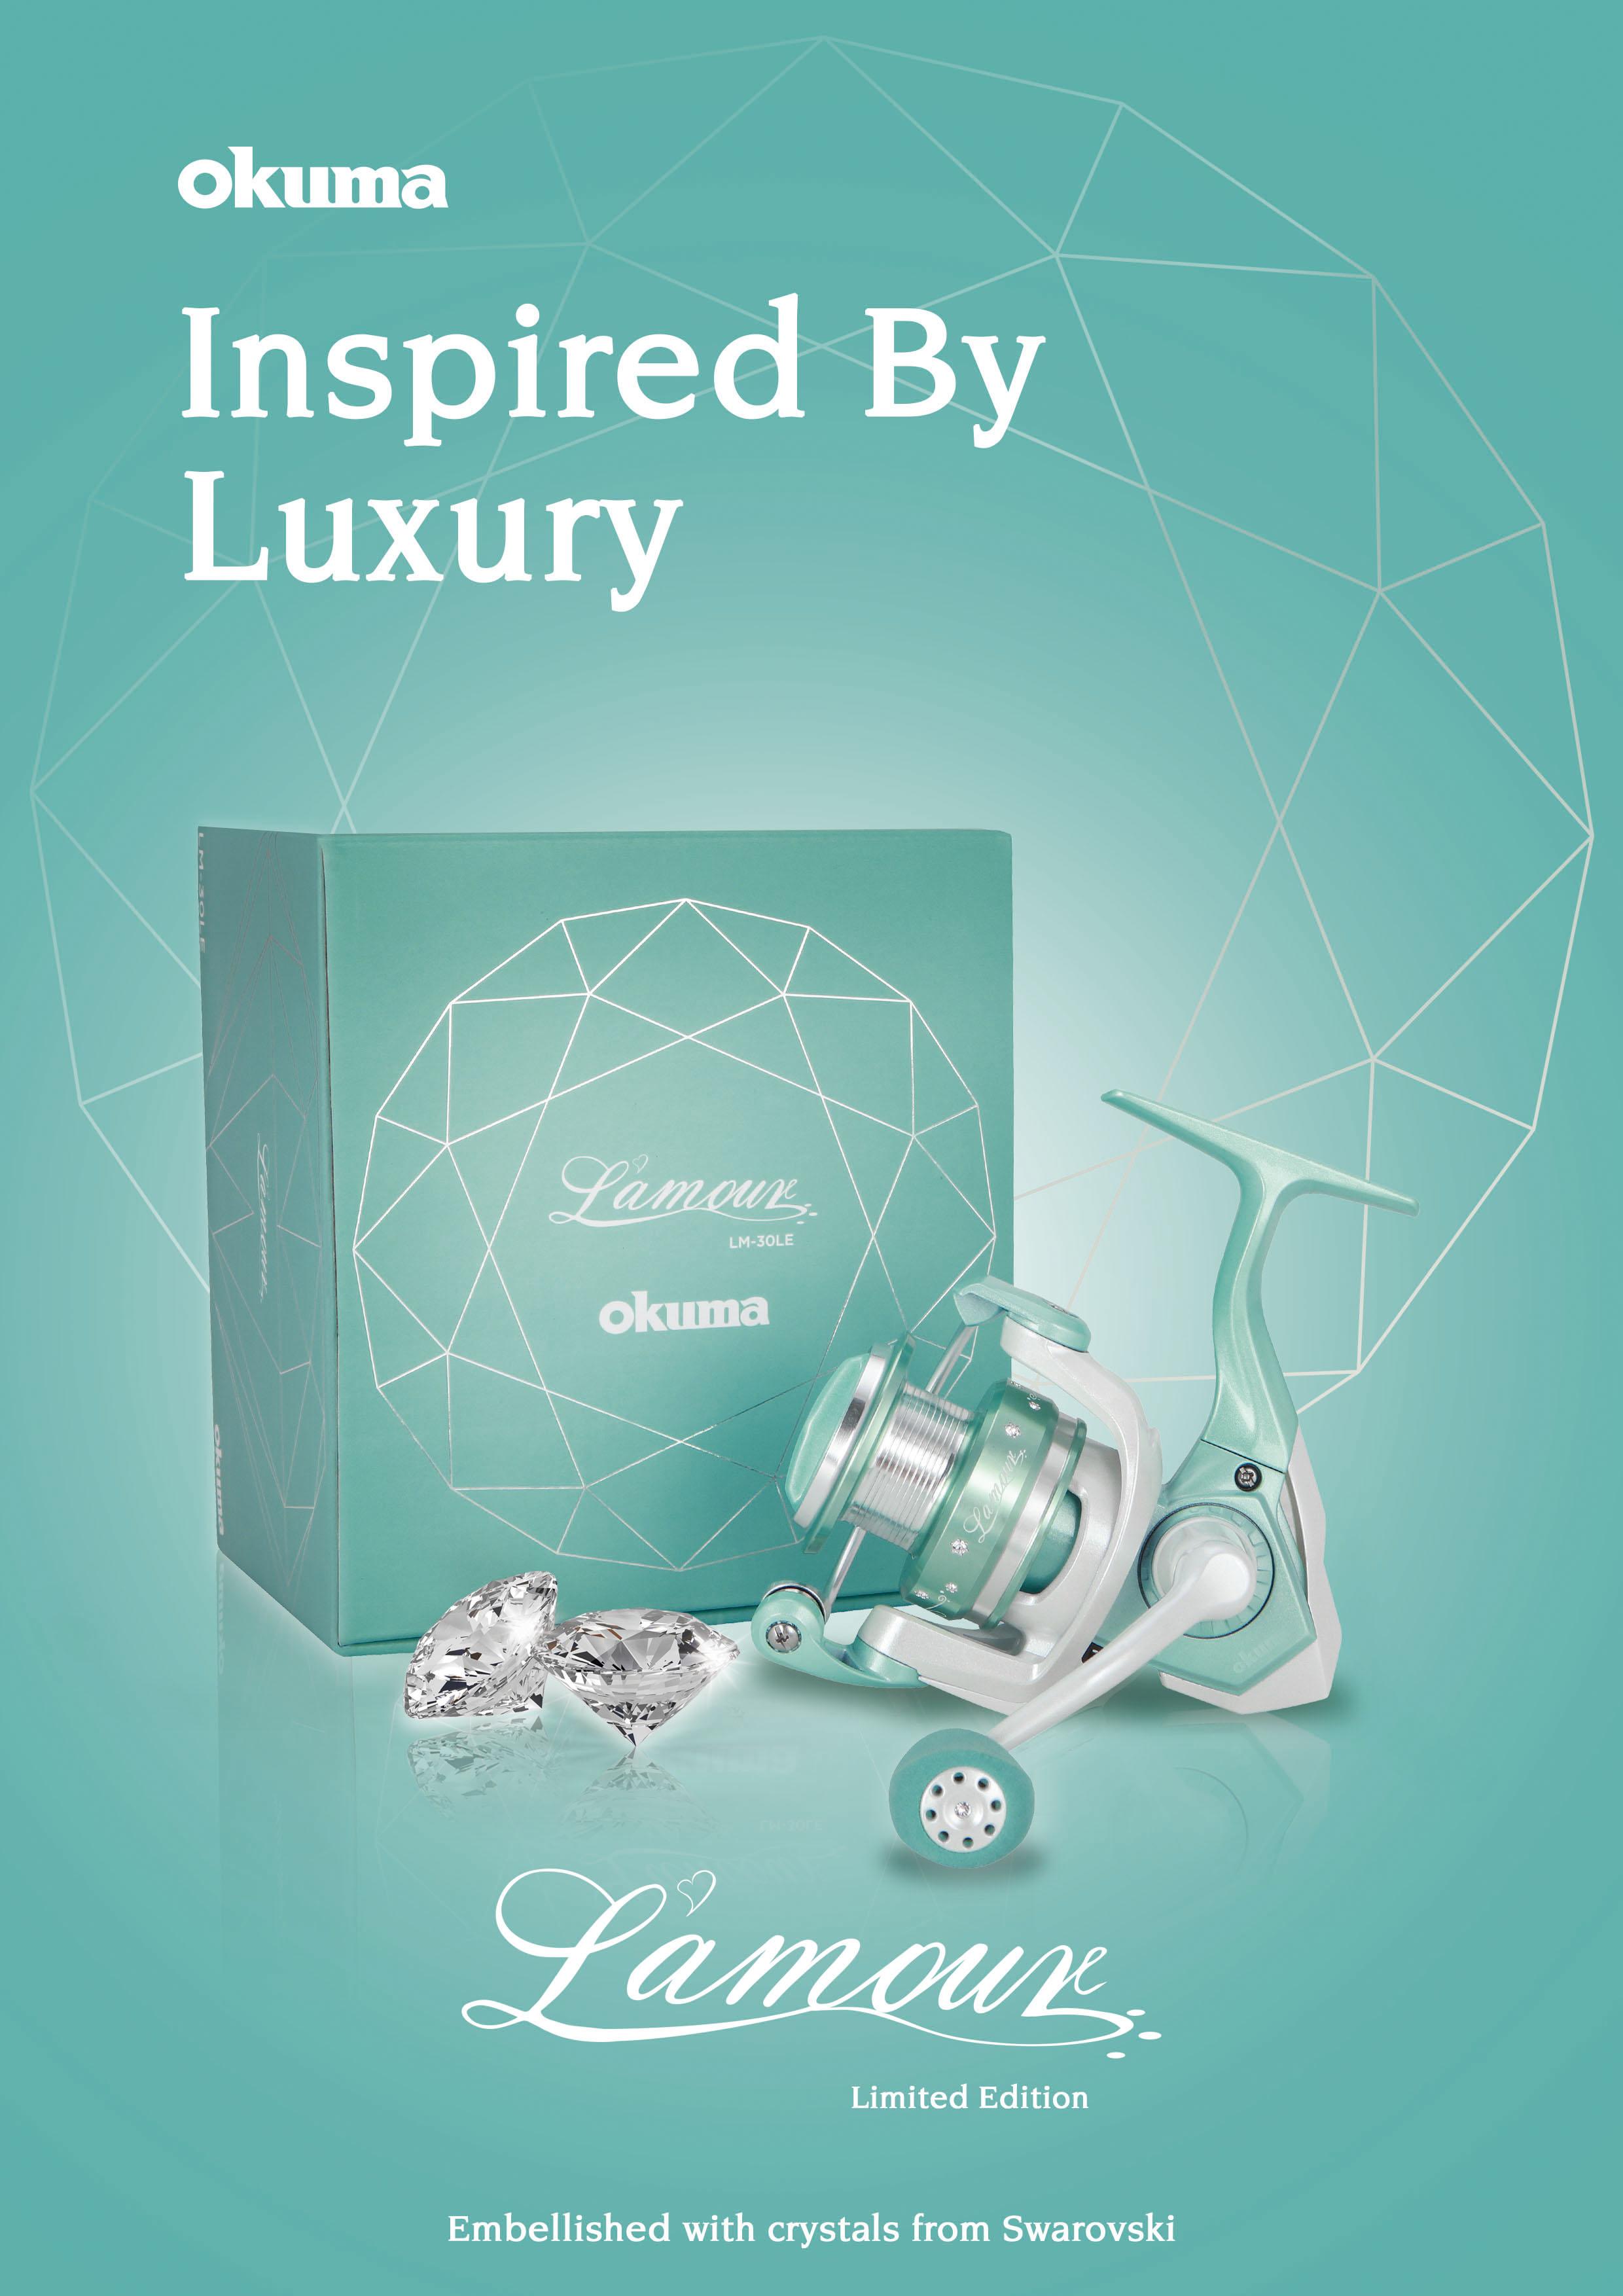 L'amour Spinning Reel (Limited Edition) - Okuma L'amour Spinning Reel-Limited Edition-13 Swarovski Crystals